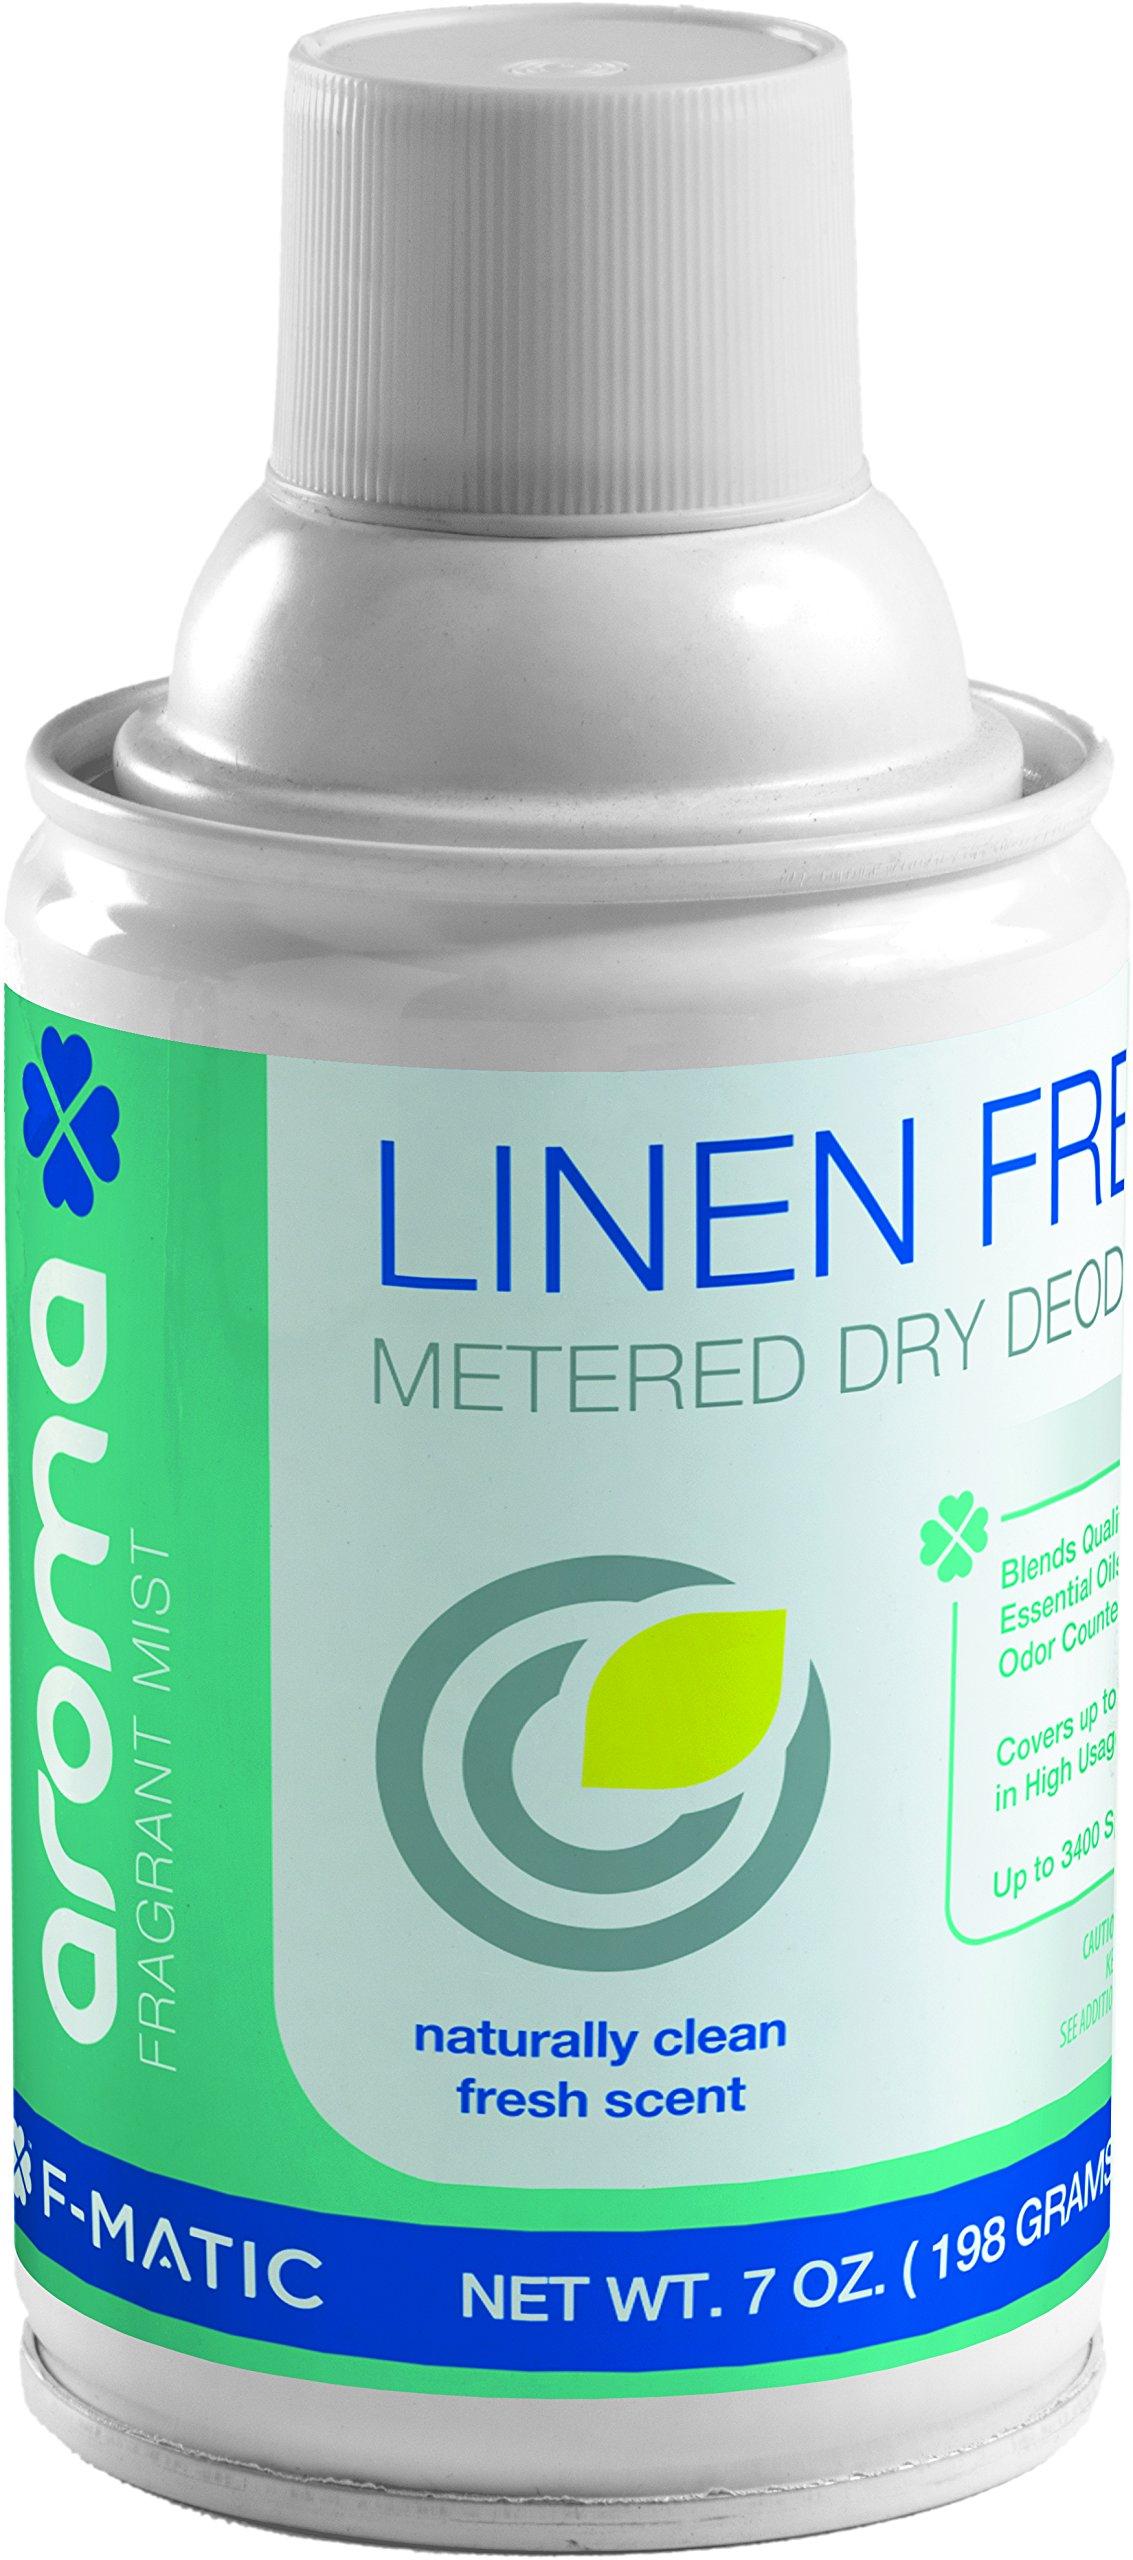 F-Matic AE200 Metered Spray Air Freshener Refill, Linen Fresh (Case of 12)